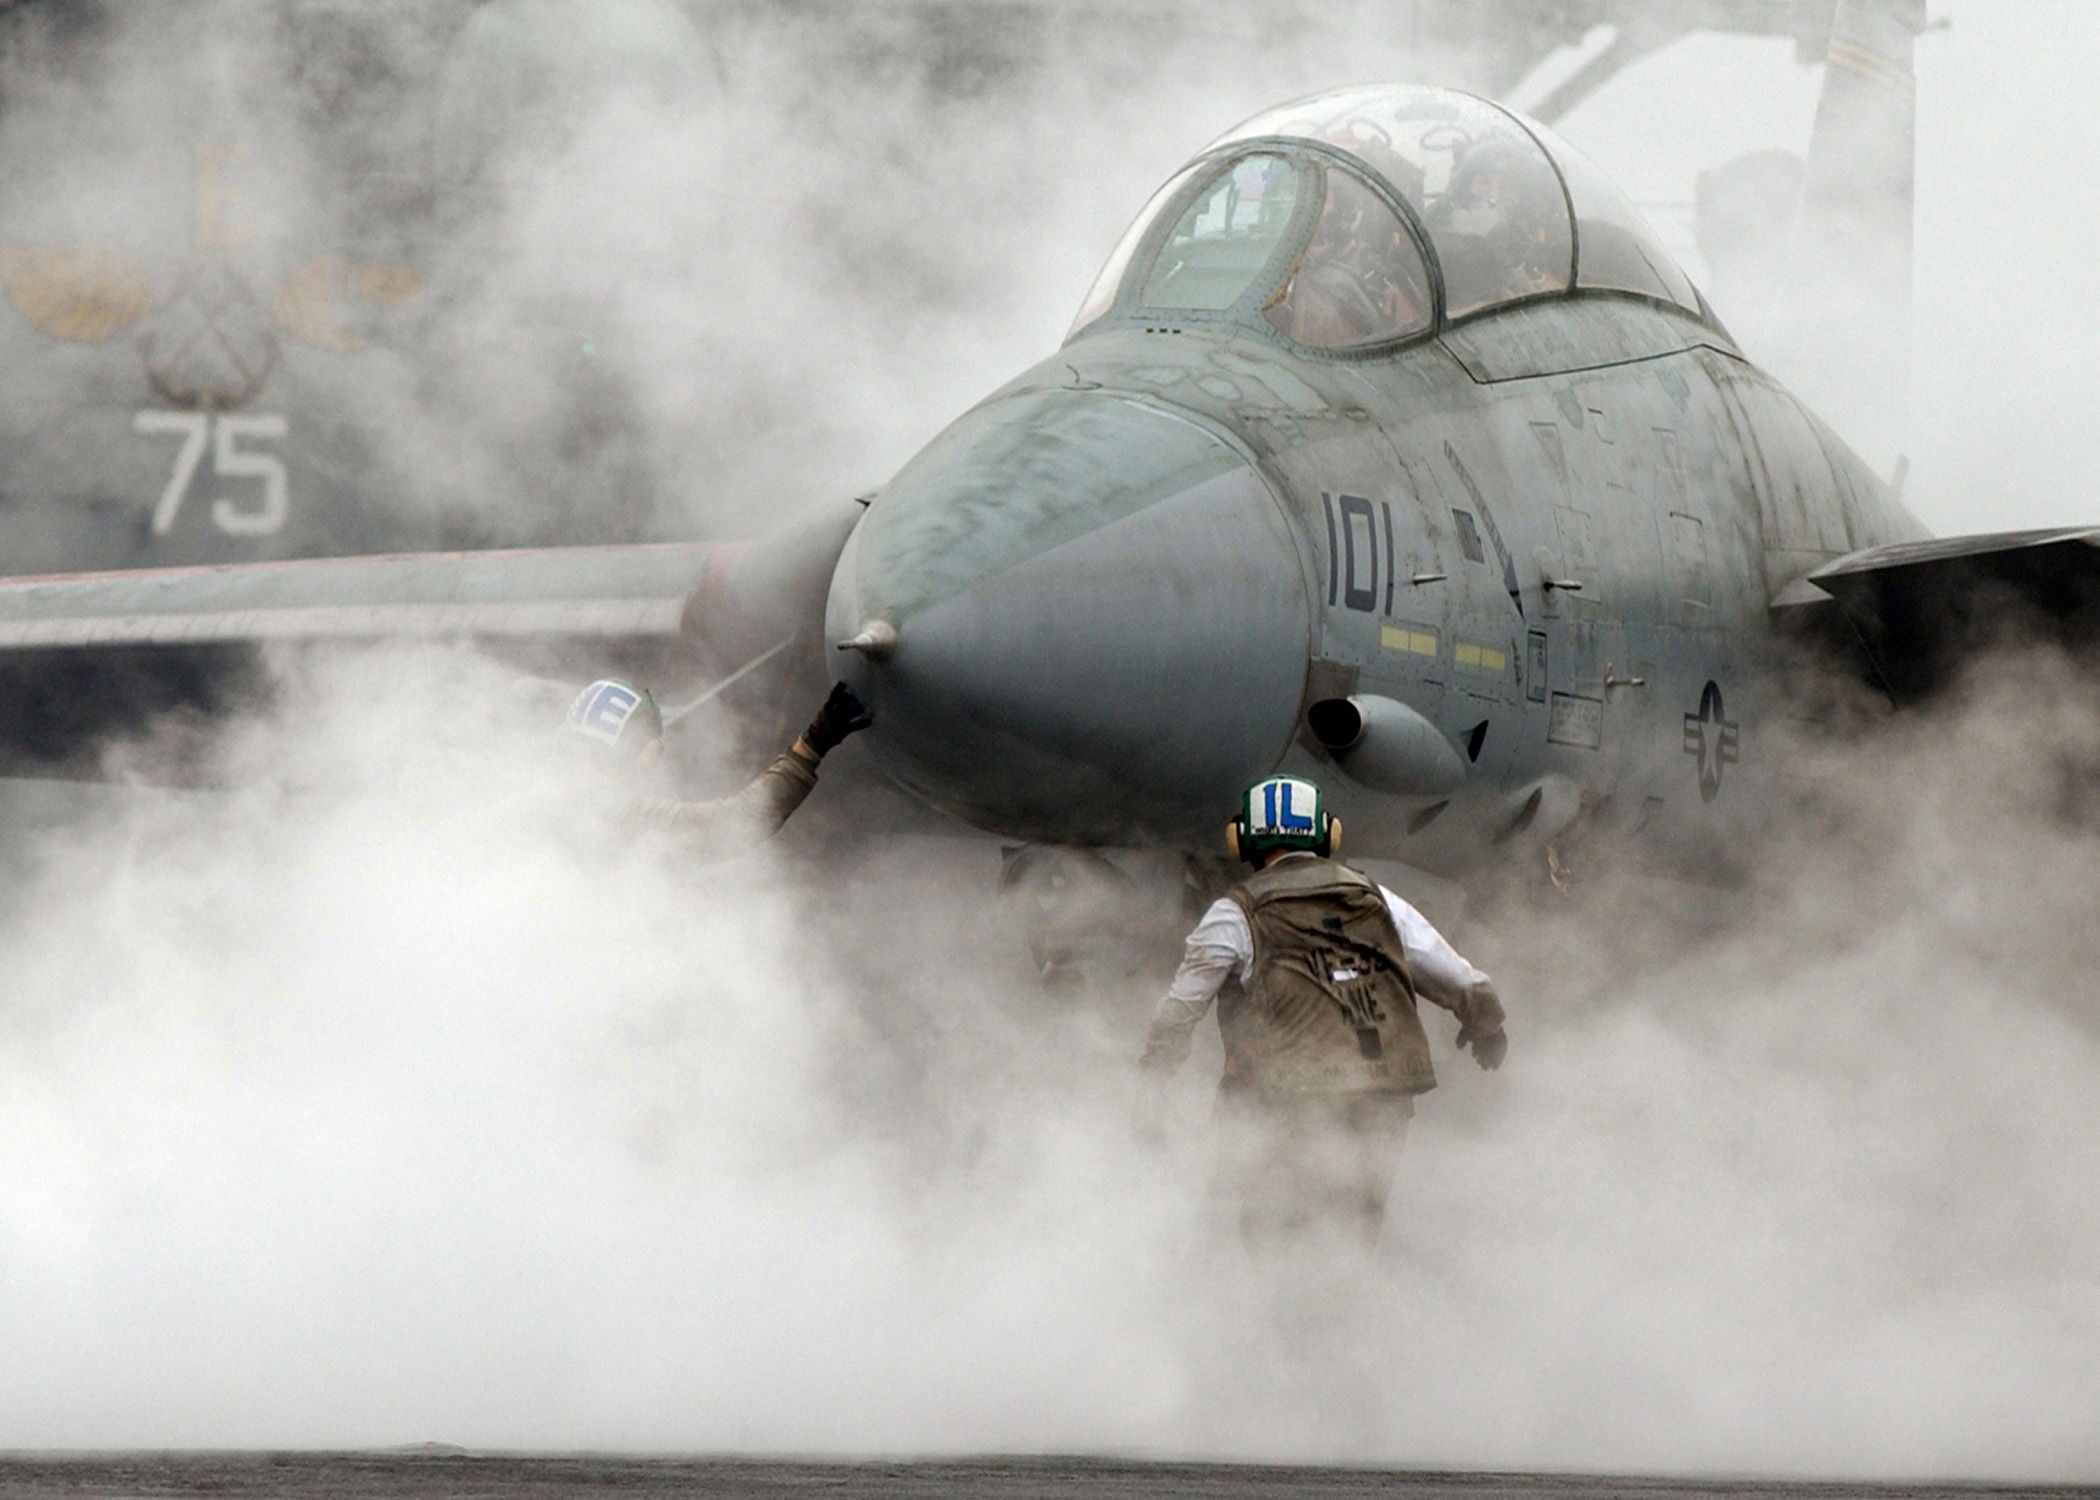 F-14 A/B von Heatblur Simulations - Combat Pilot im DCS - Digital